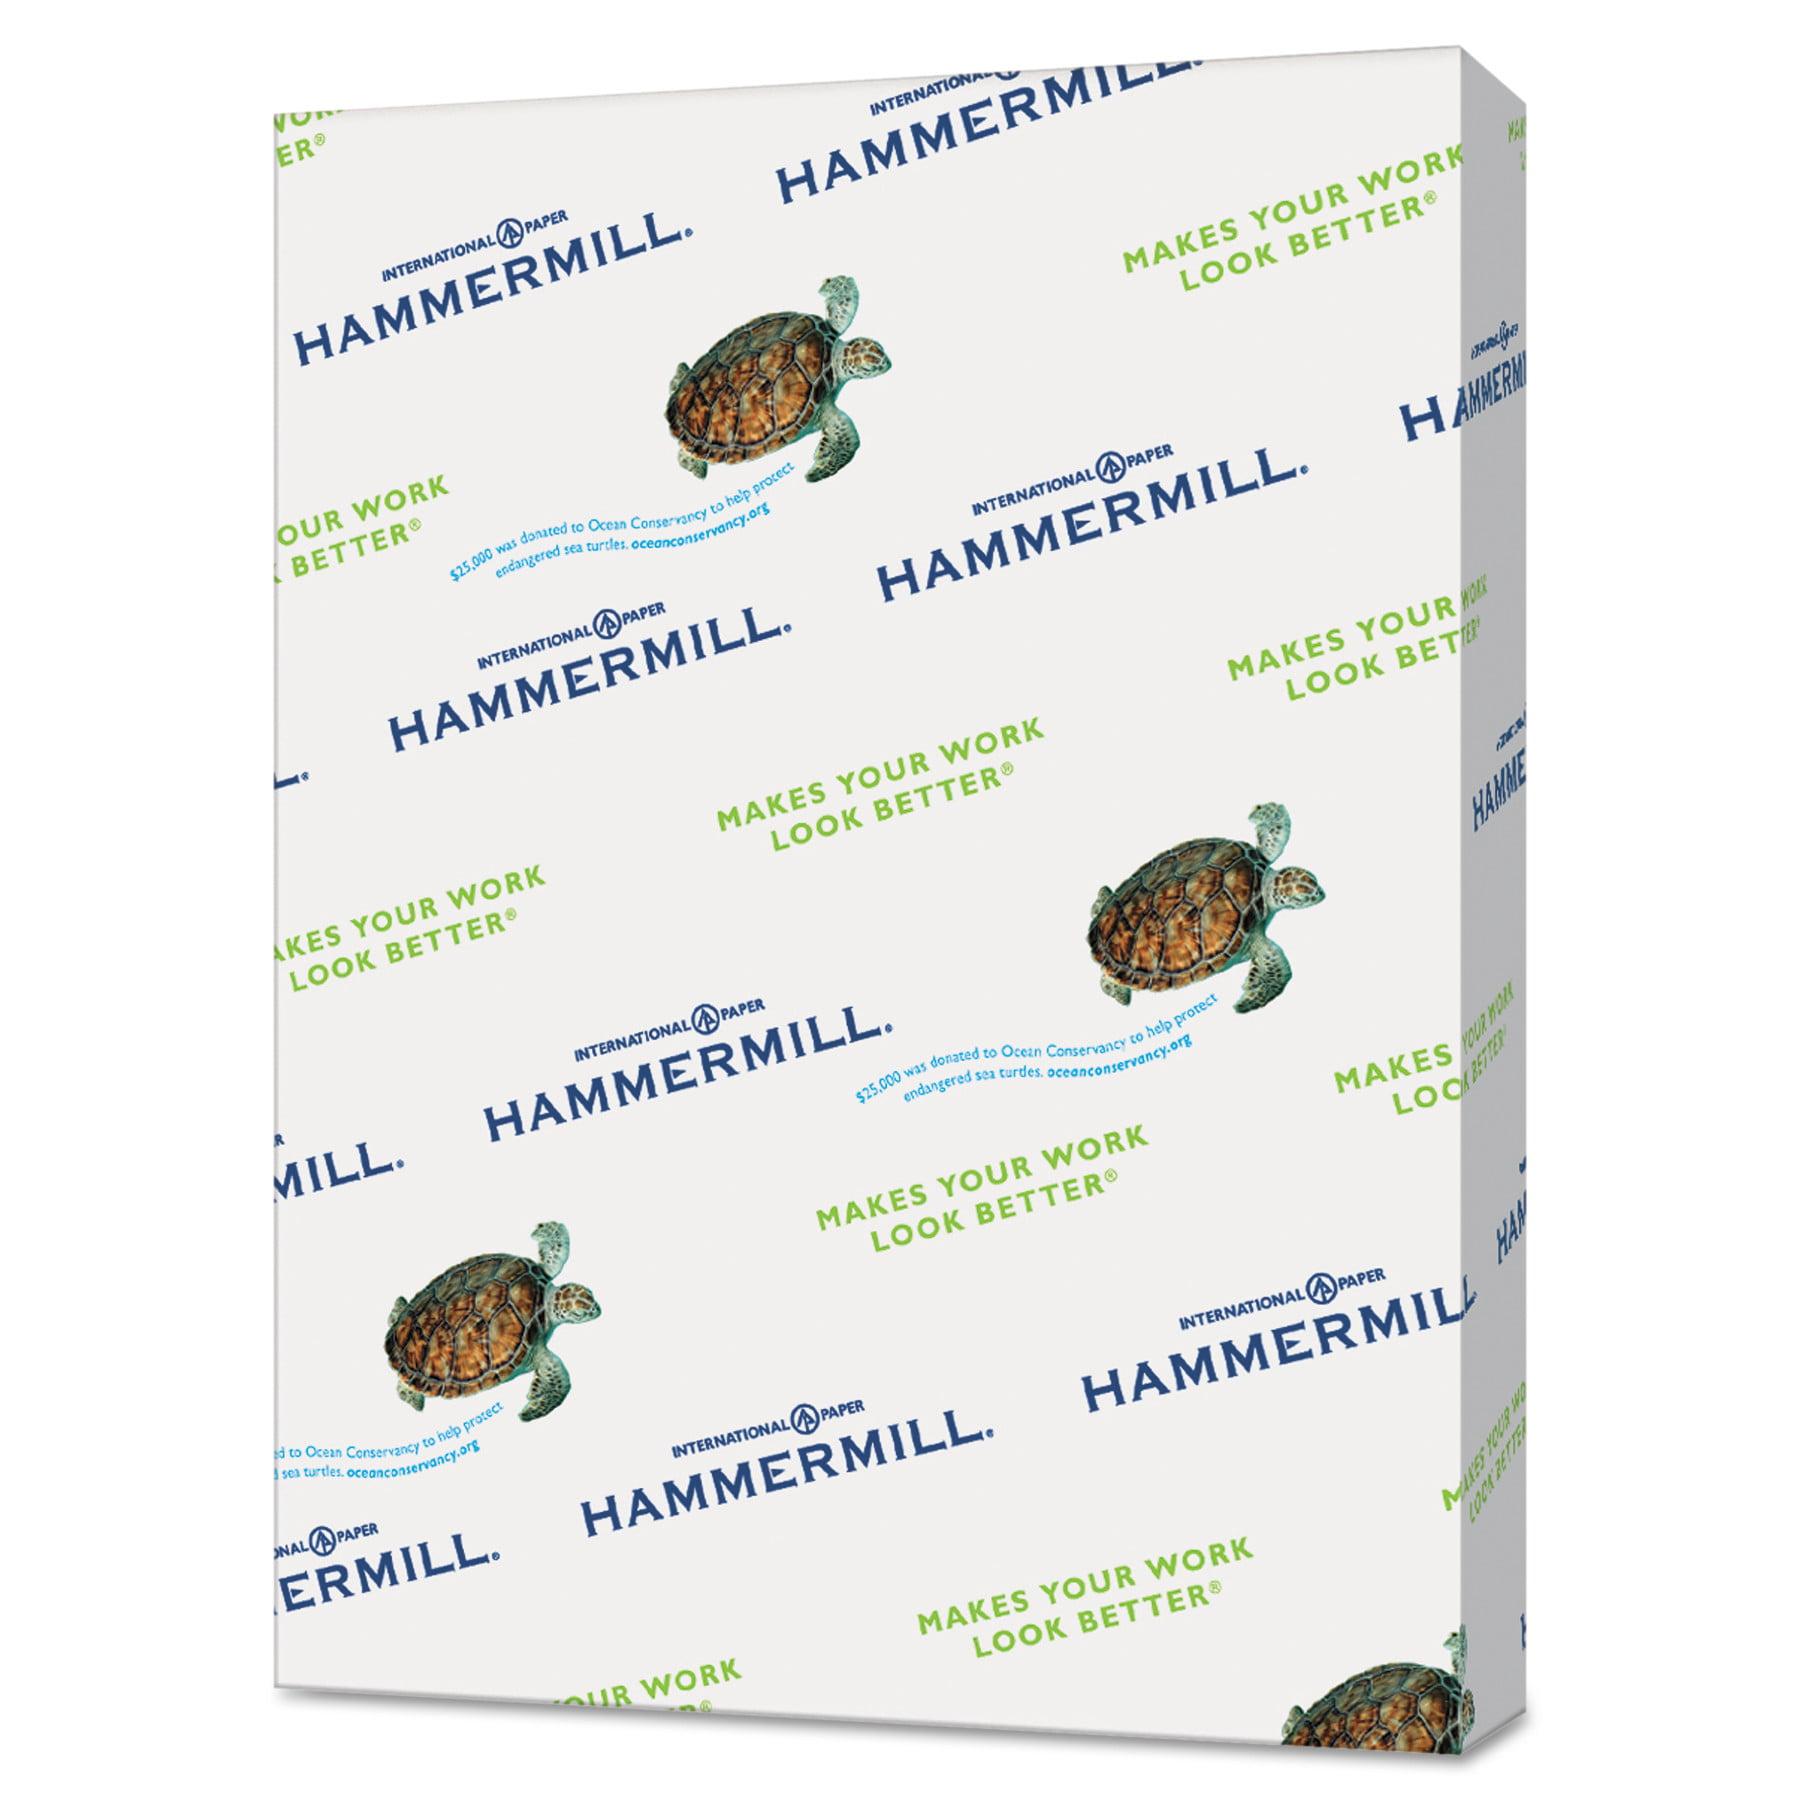 Hammermill Colors Colored Paper, Light Cherry, 5000 / Carton (Quantity)